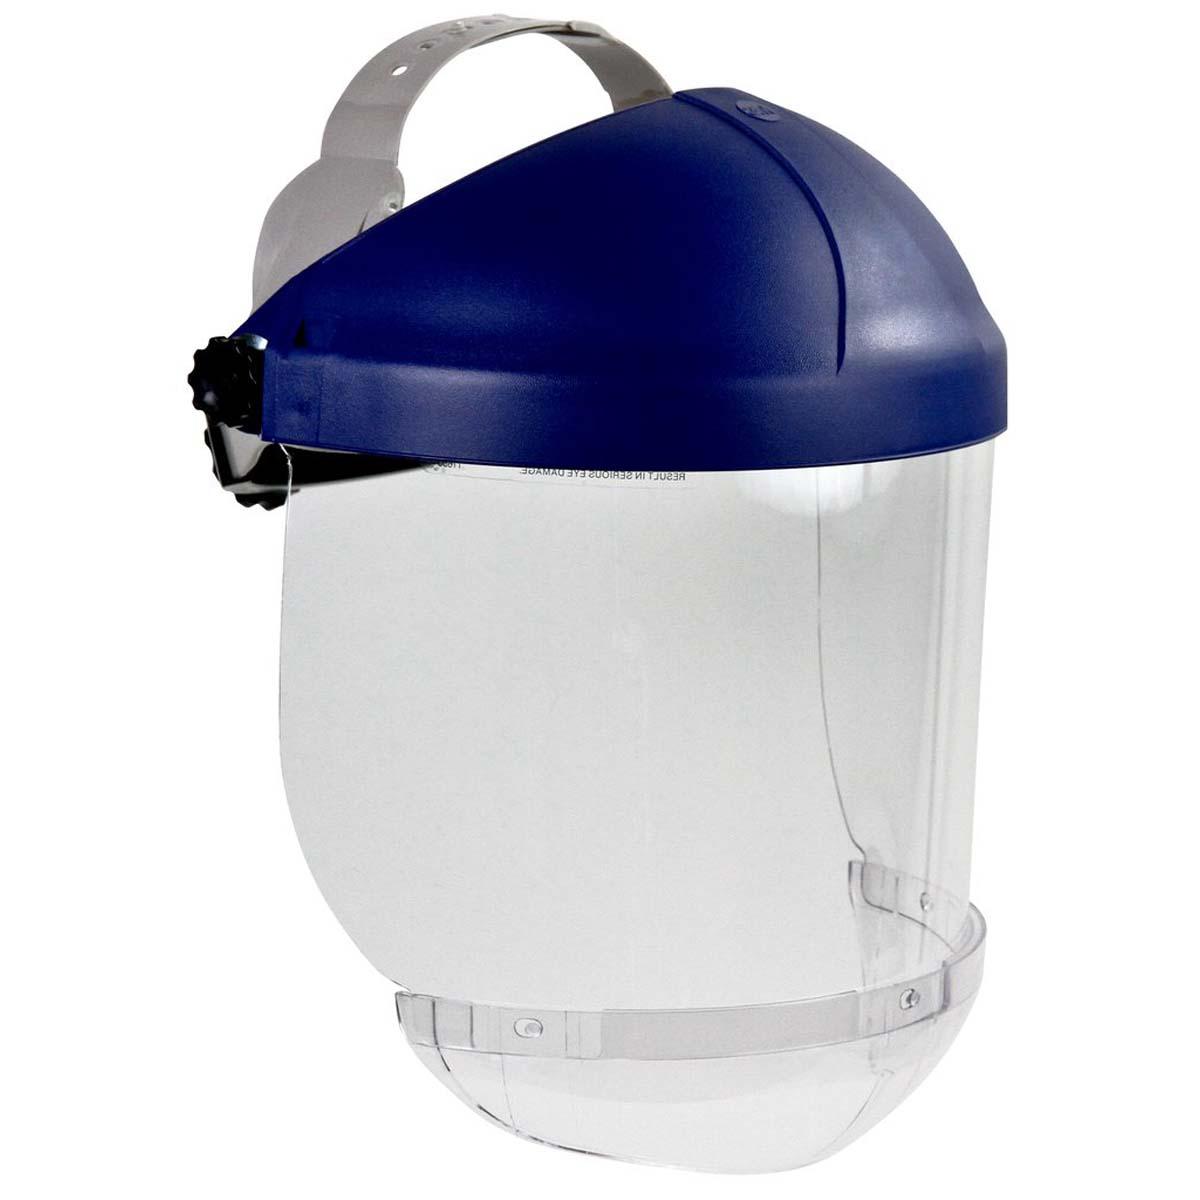 "3Mâ""¢ Ratchet Headgear 82521-10000, with 3Mâ""¢ Clear Chin Protector HCP8, Visor Not Included"